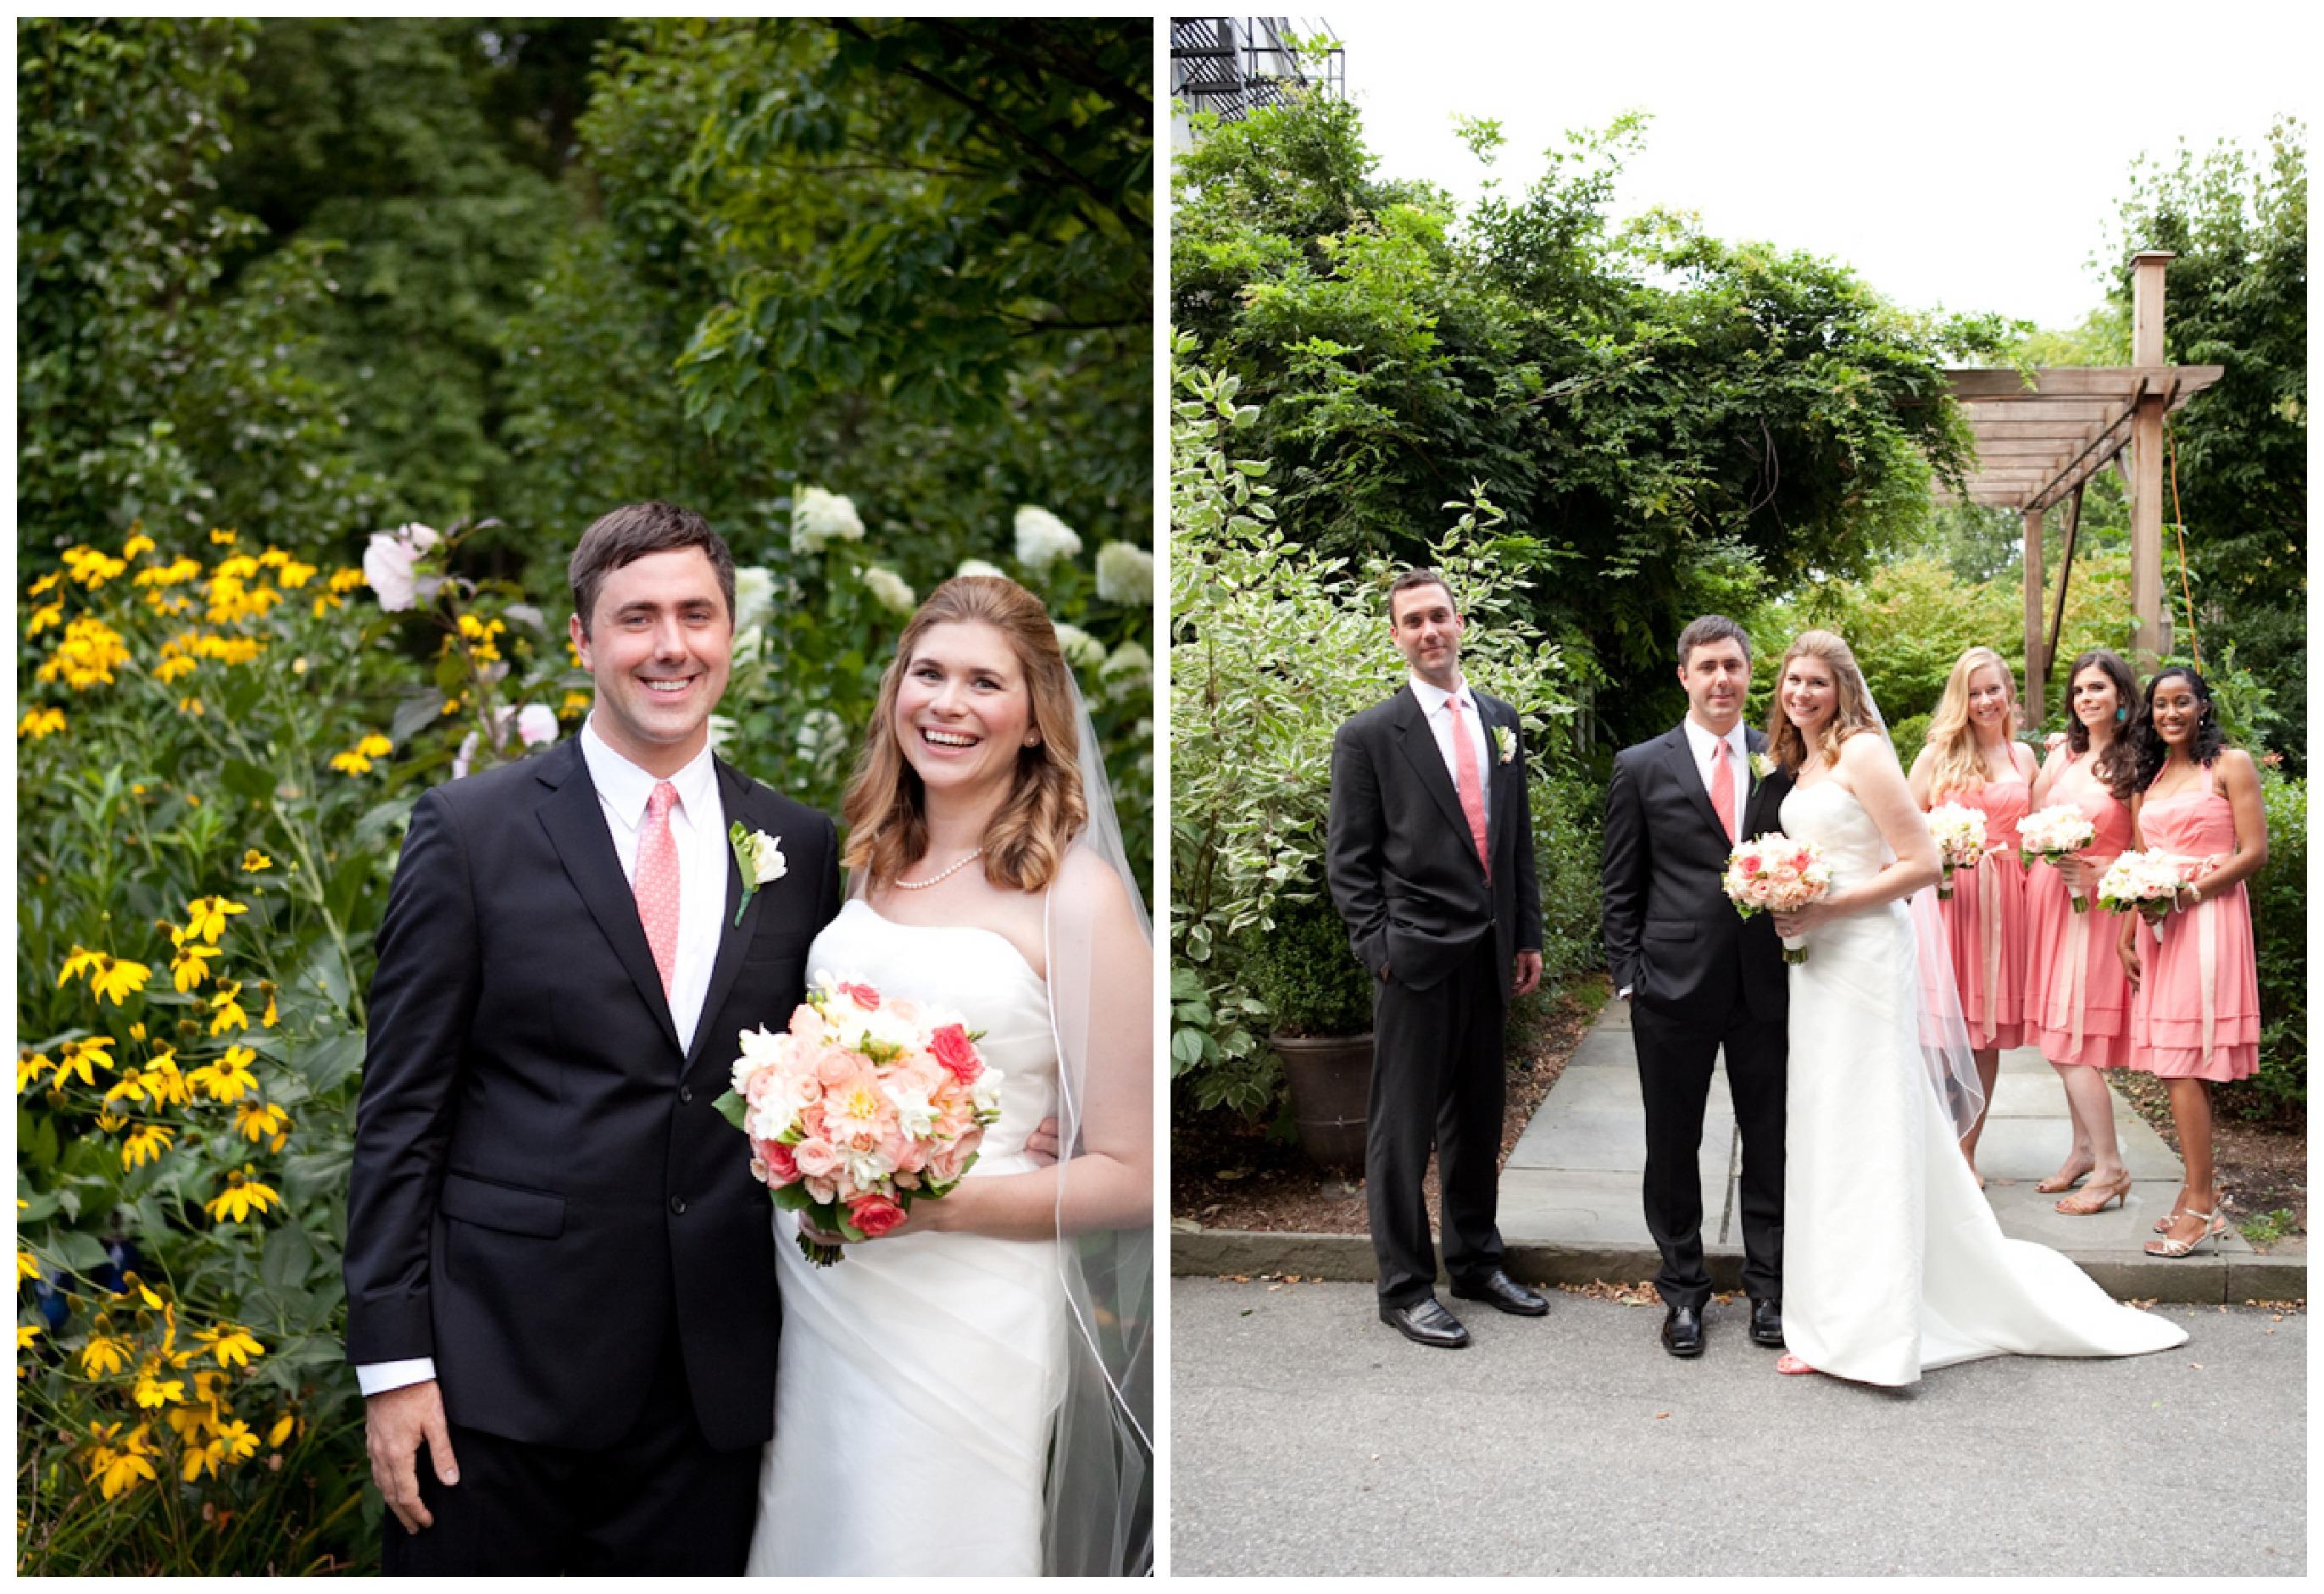 Chappaqua New York Outdoor Wedding Rustic Wedding Chic